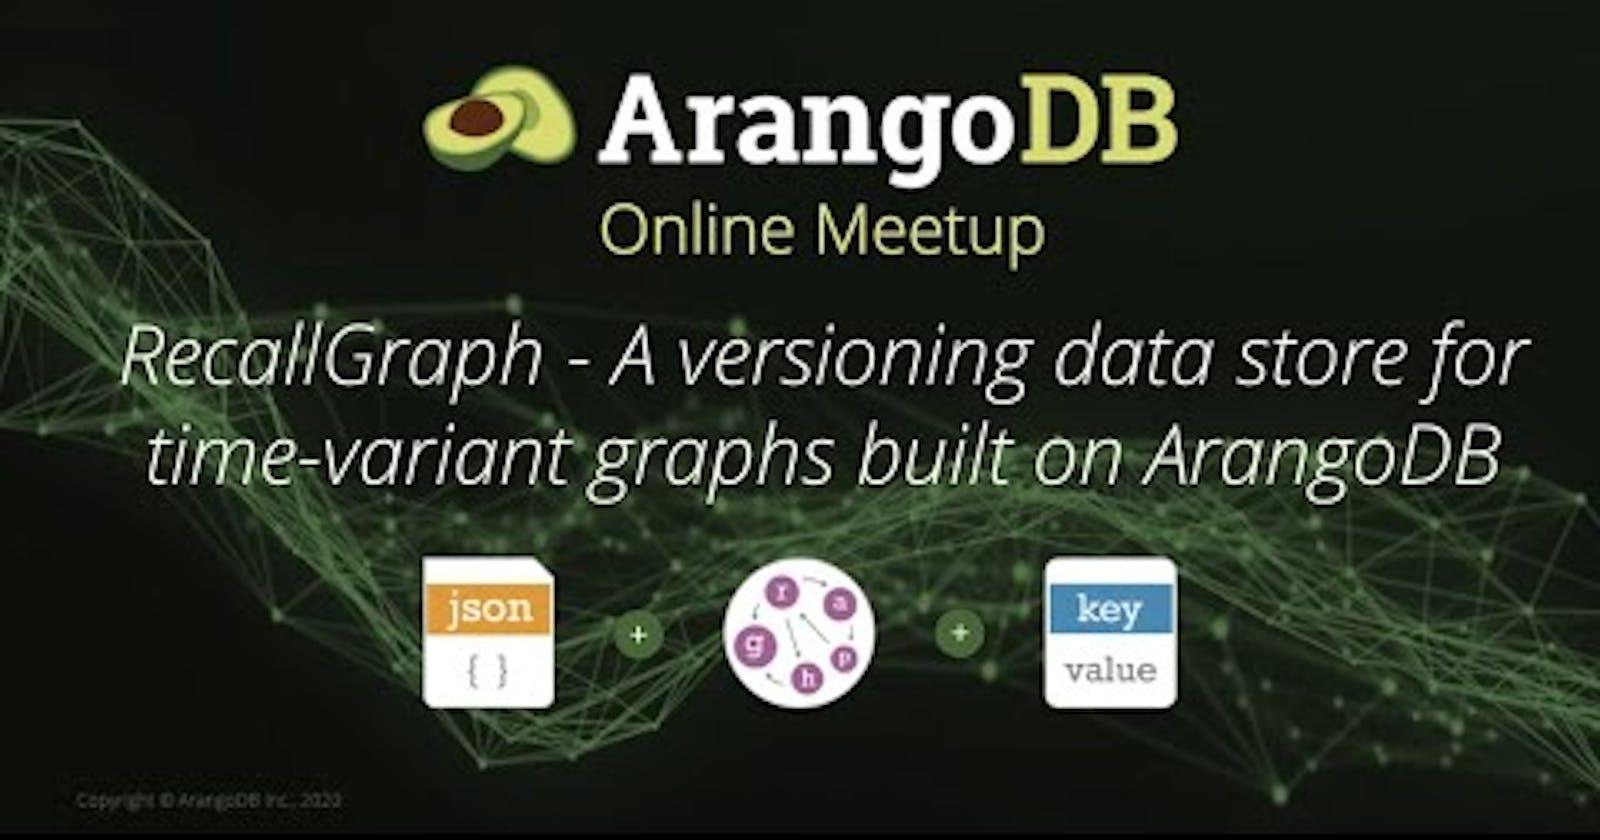 RecallGraph Presented at ArangoDB Online Meetup